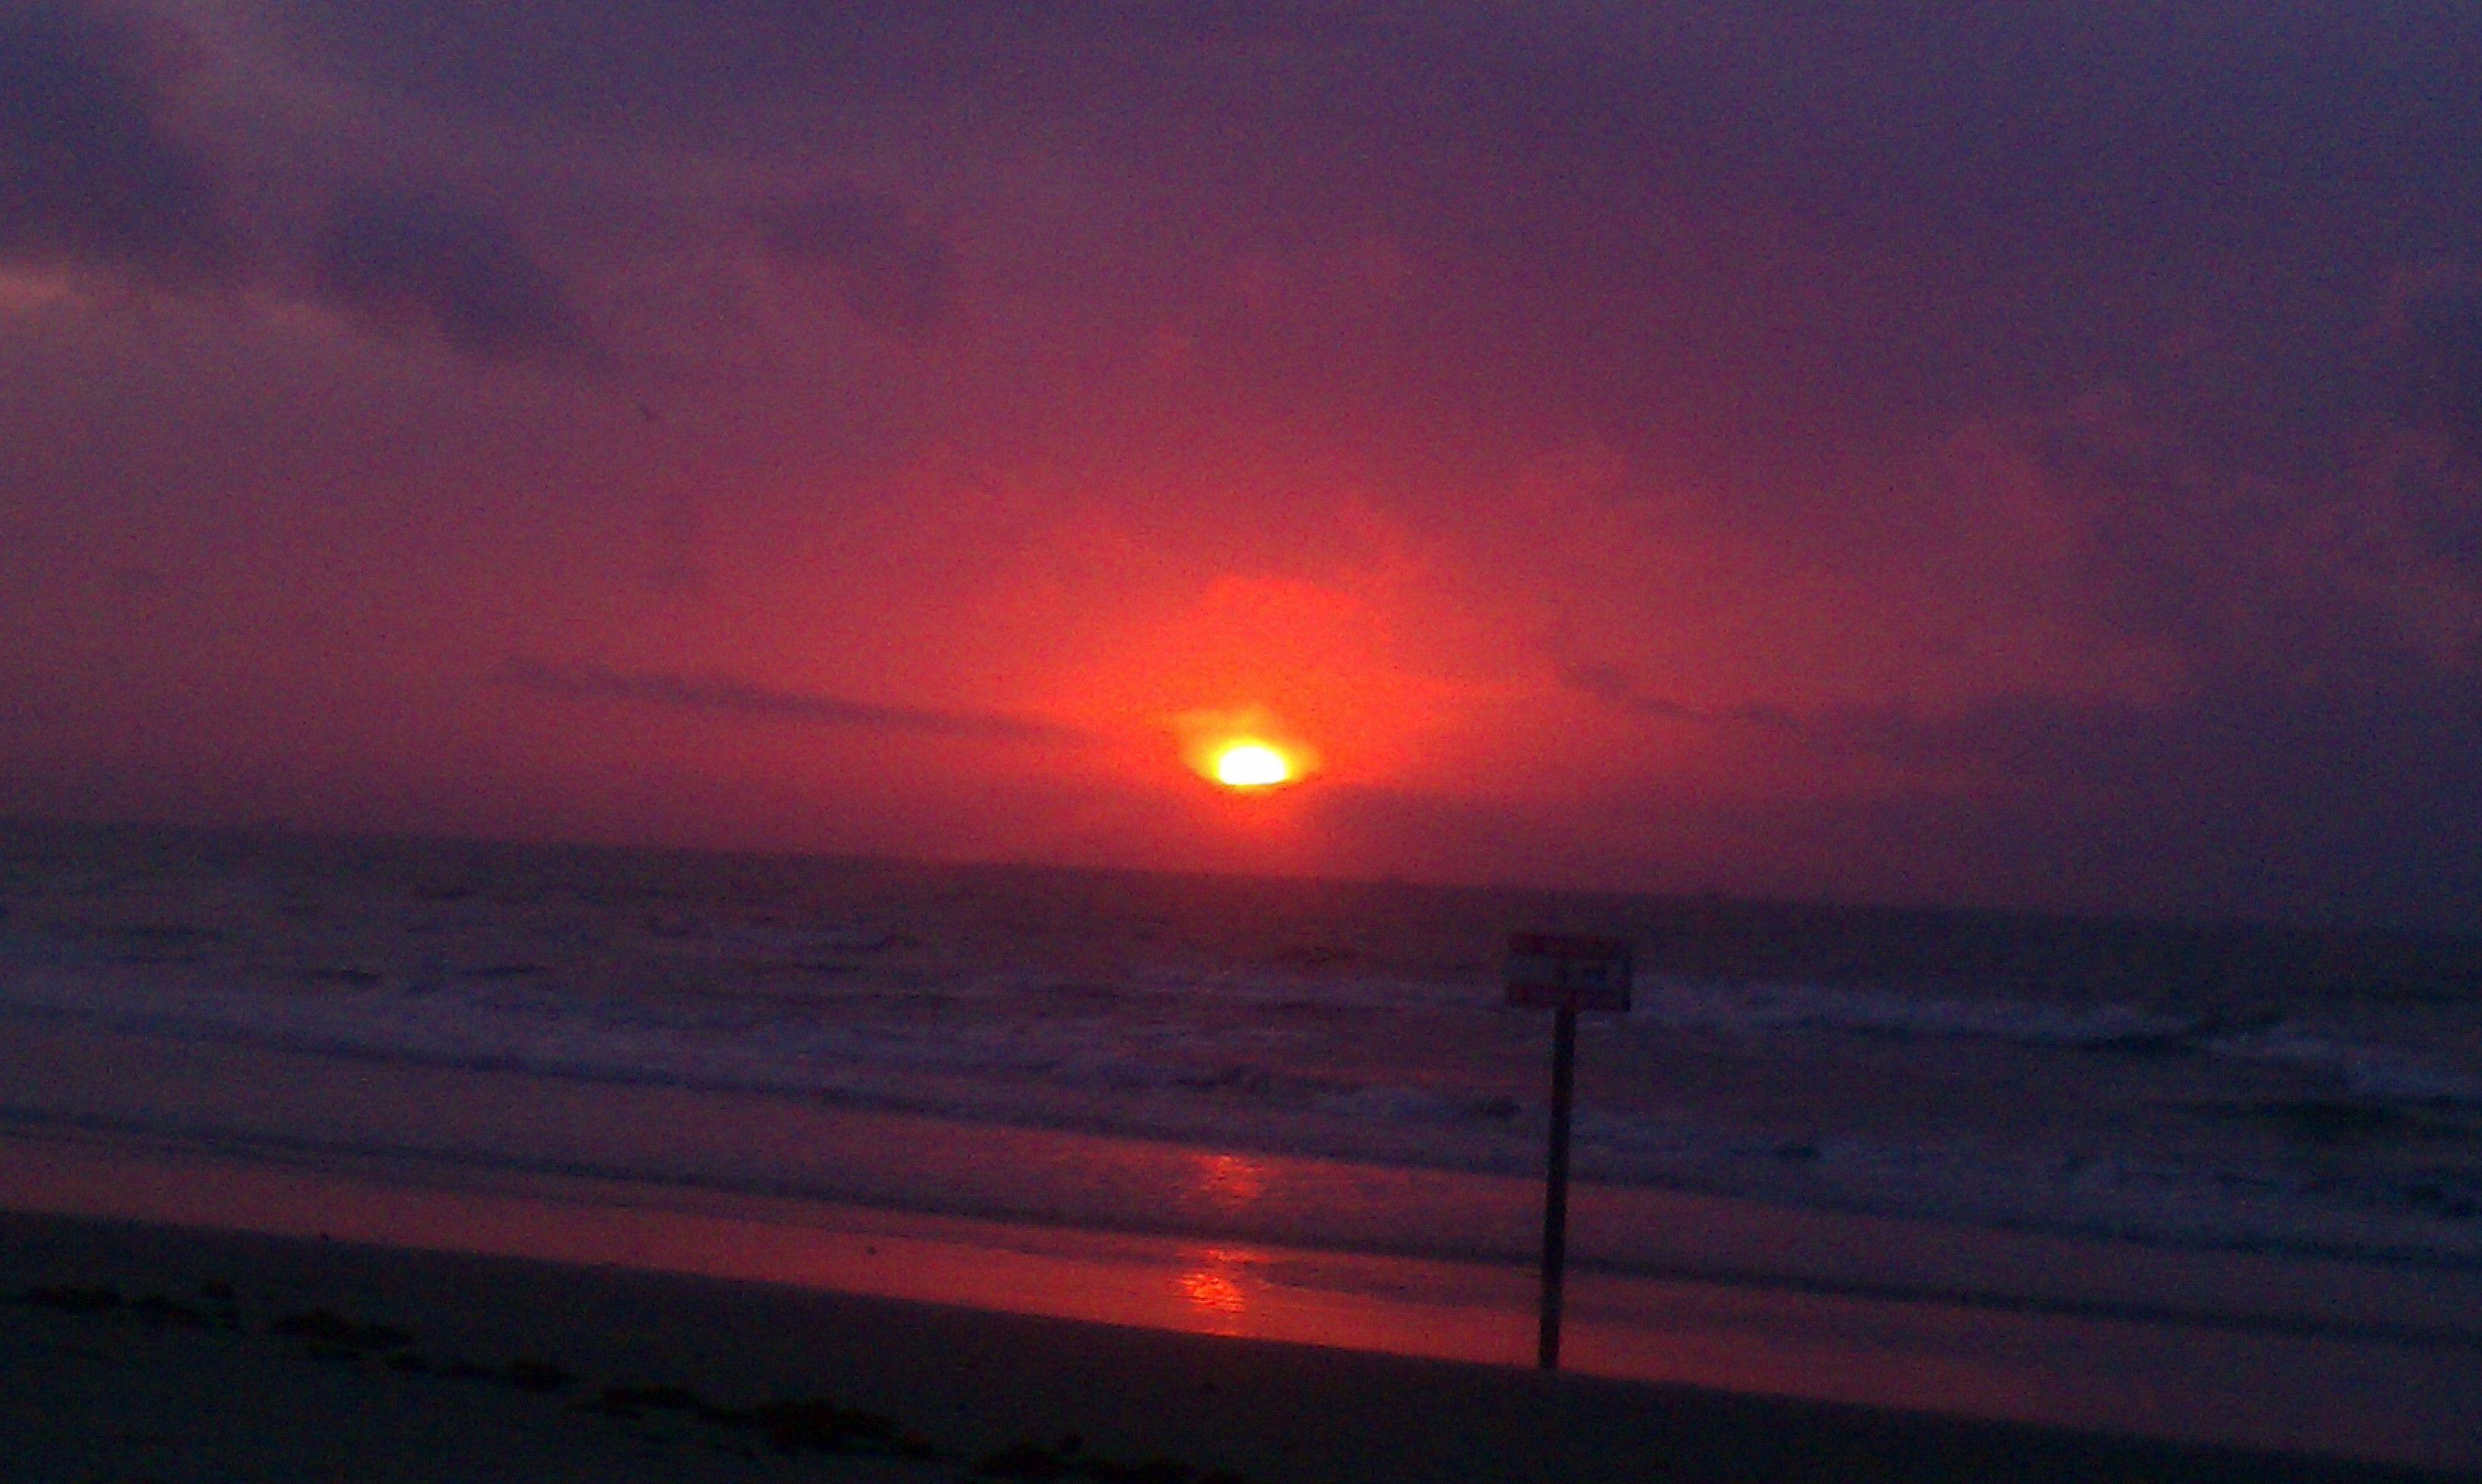 Galveston Texas at 7:27 am.